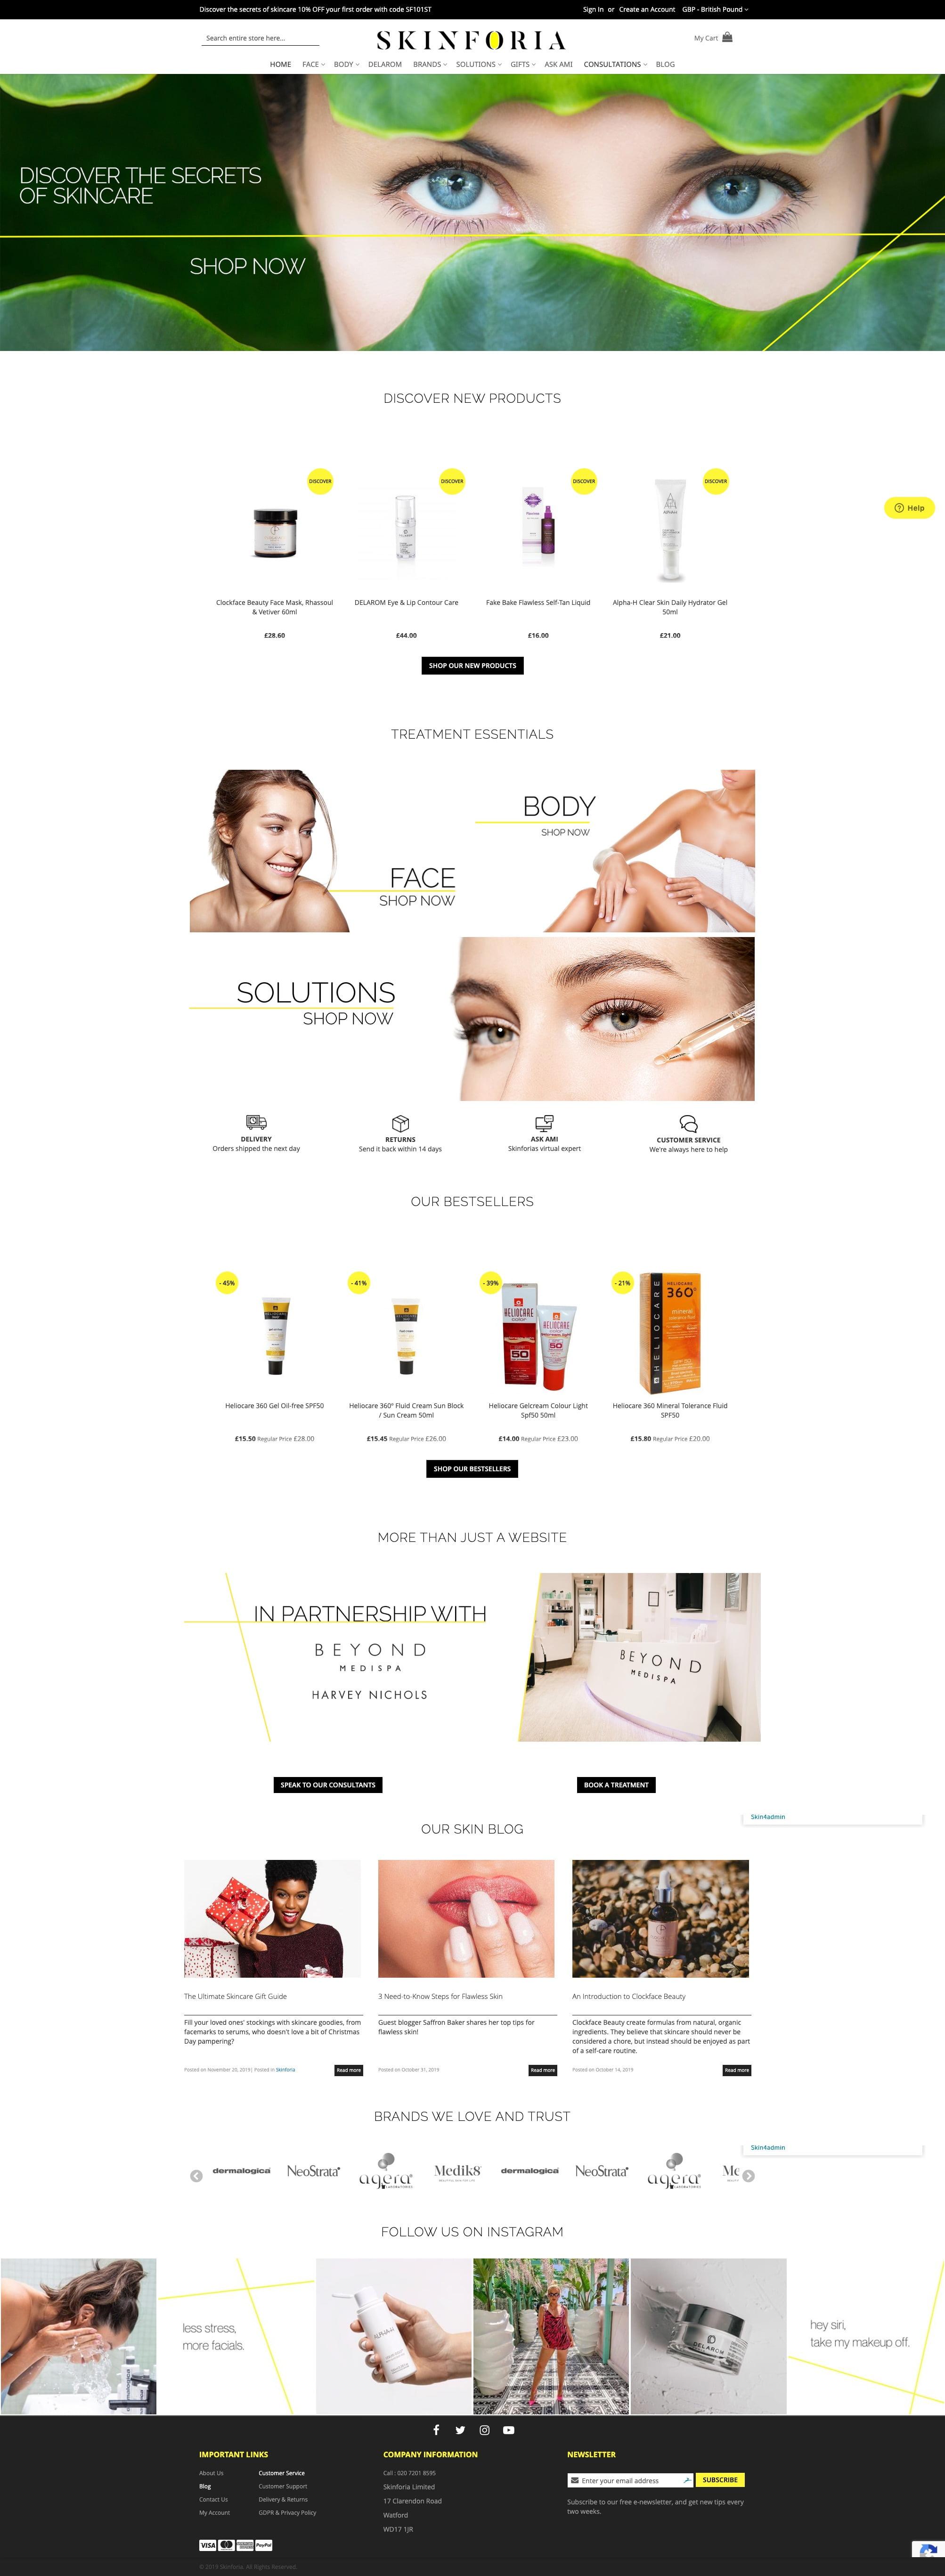 Skinforia Web Design | Shynee